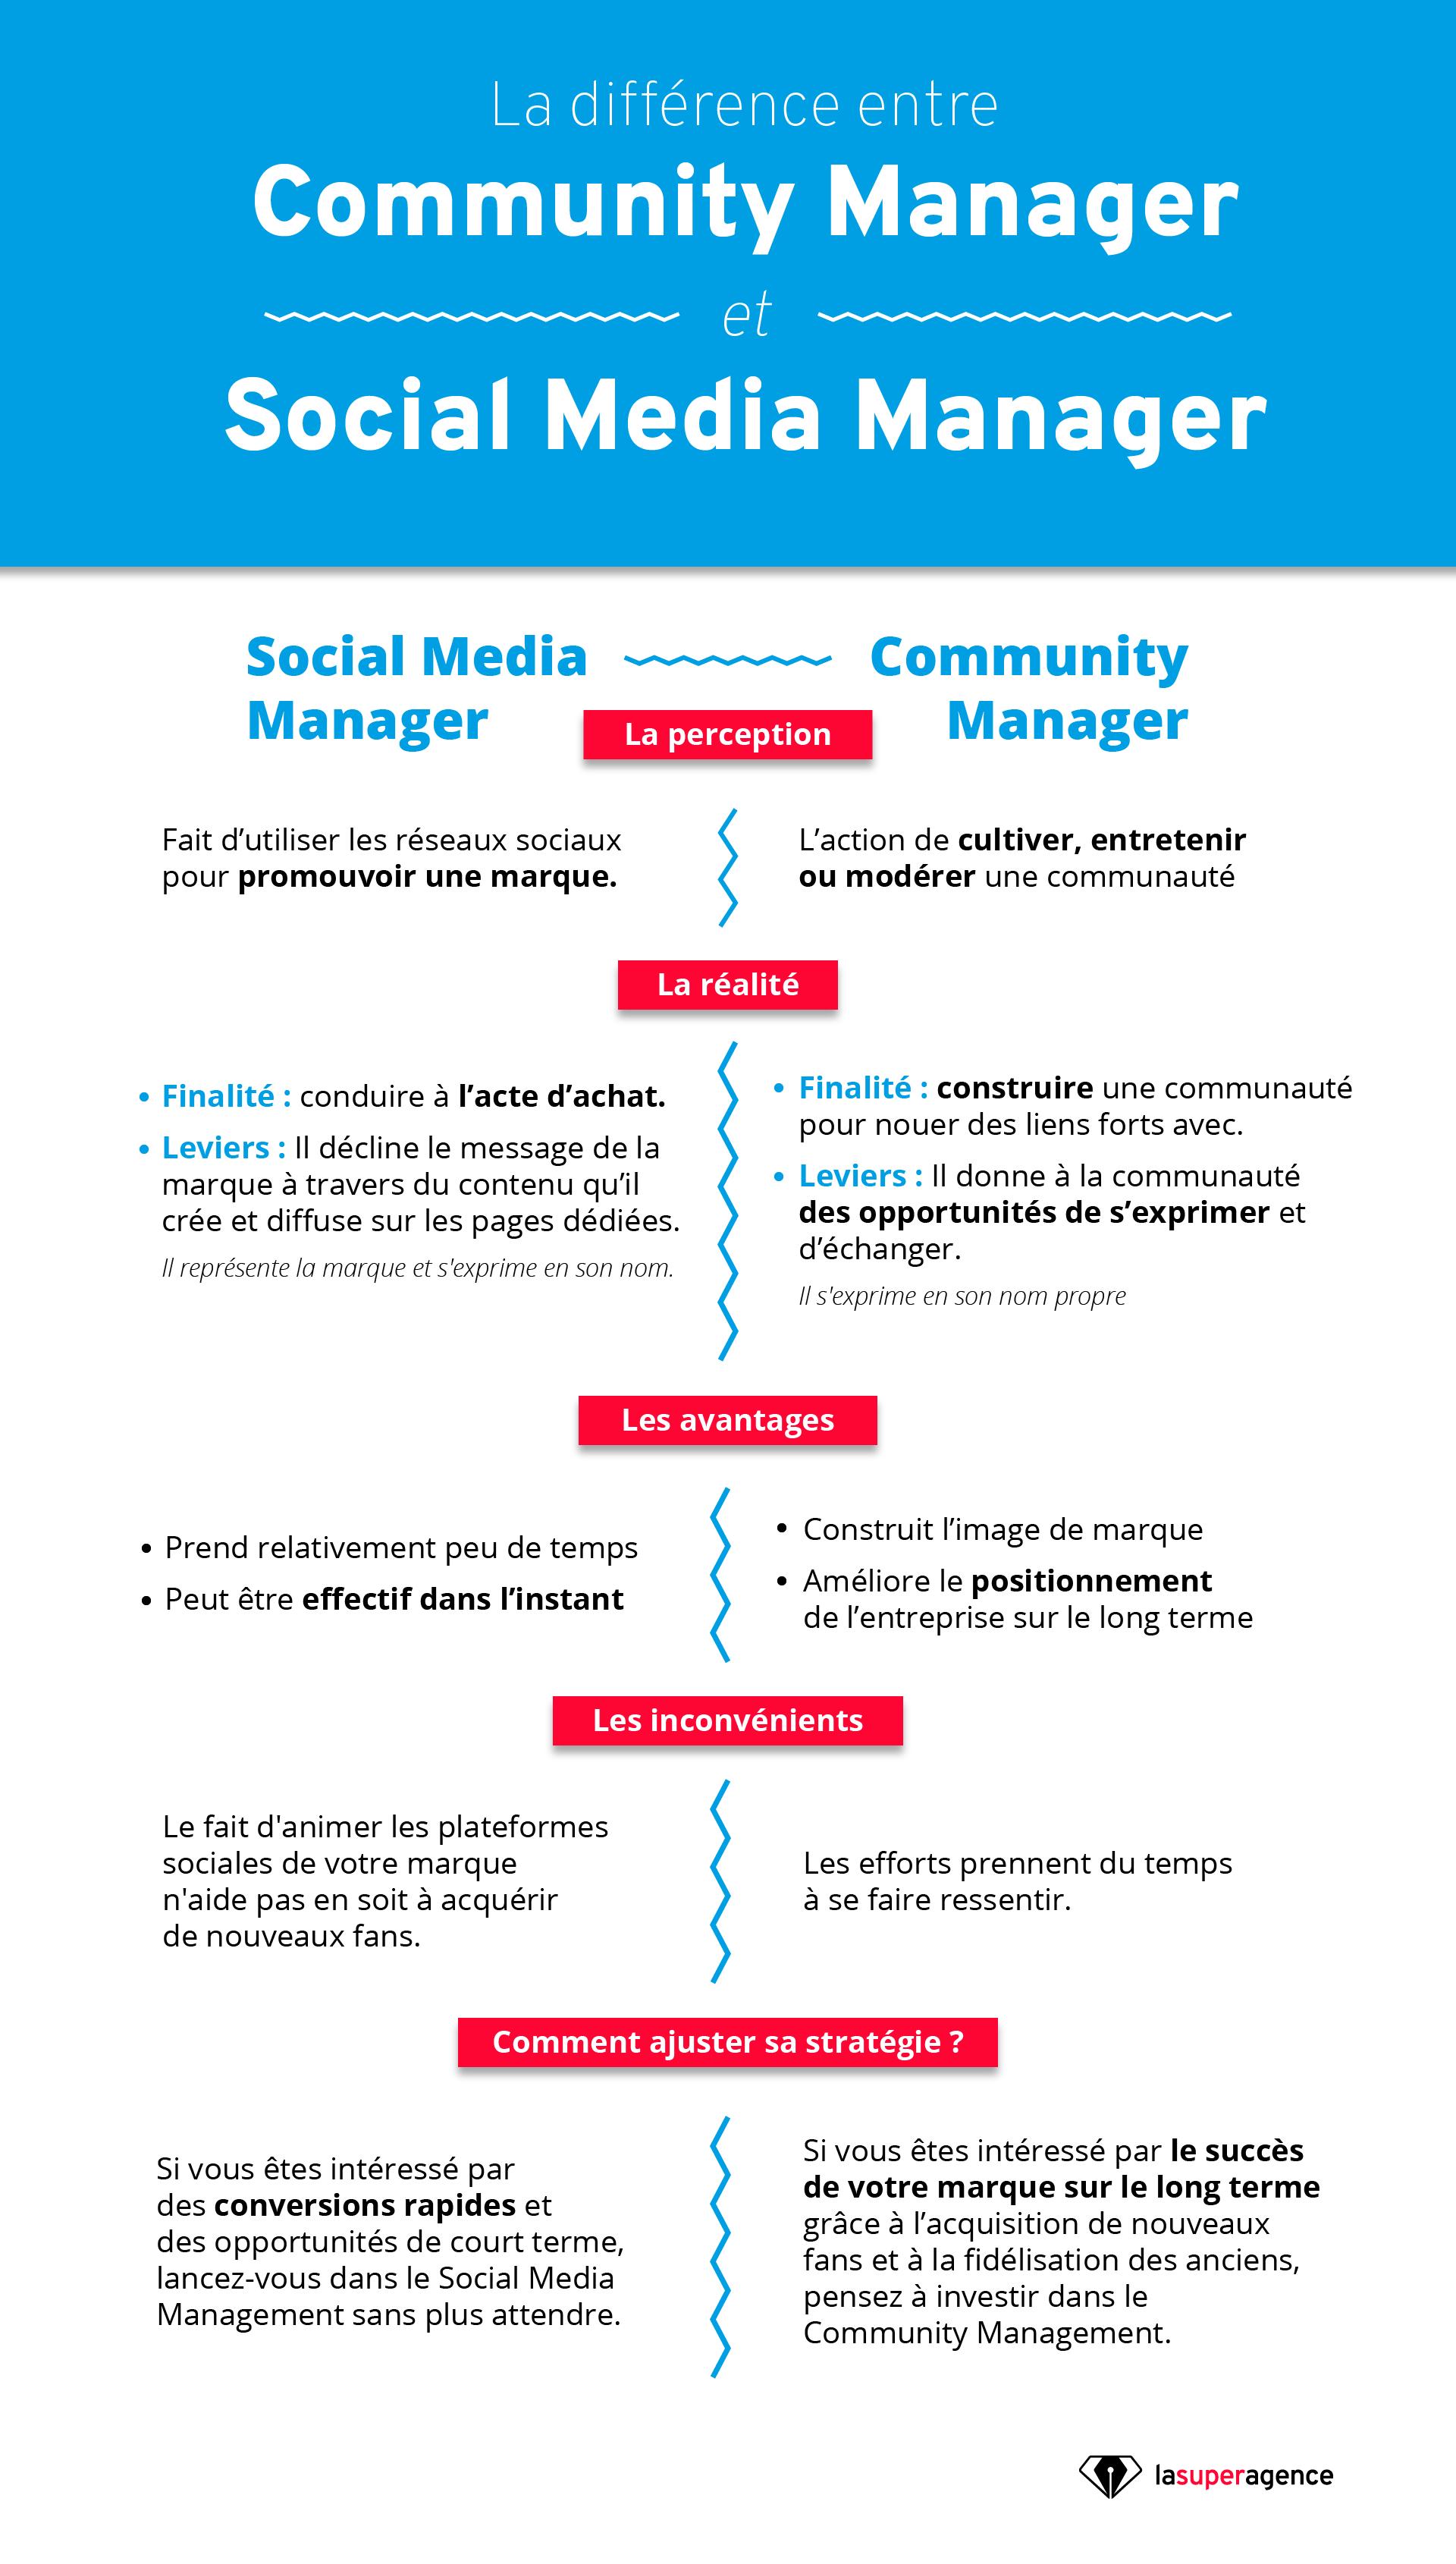 Quelle différence entre Community Manager et Social Media Manager ?